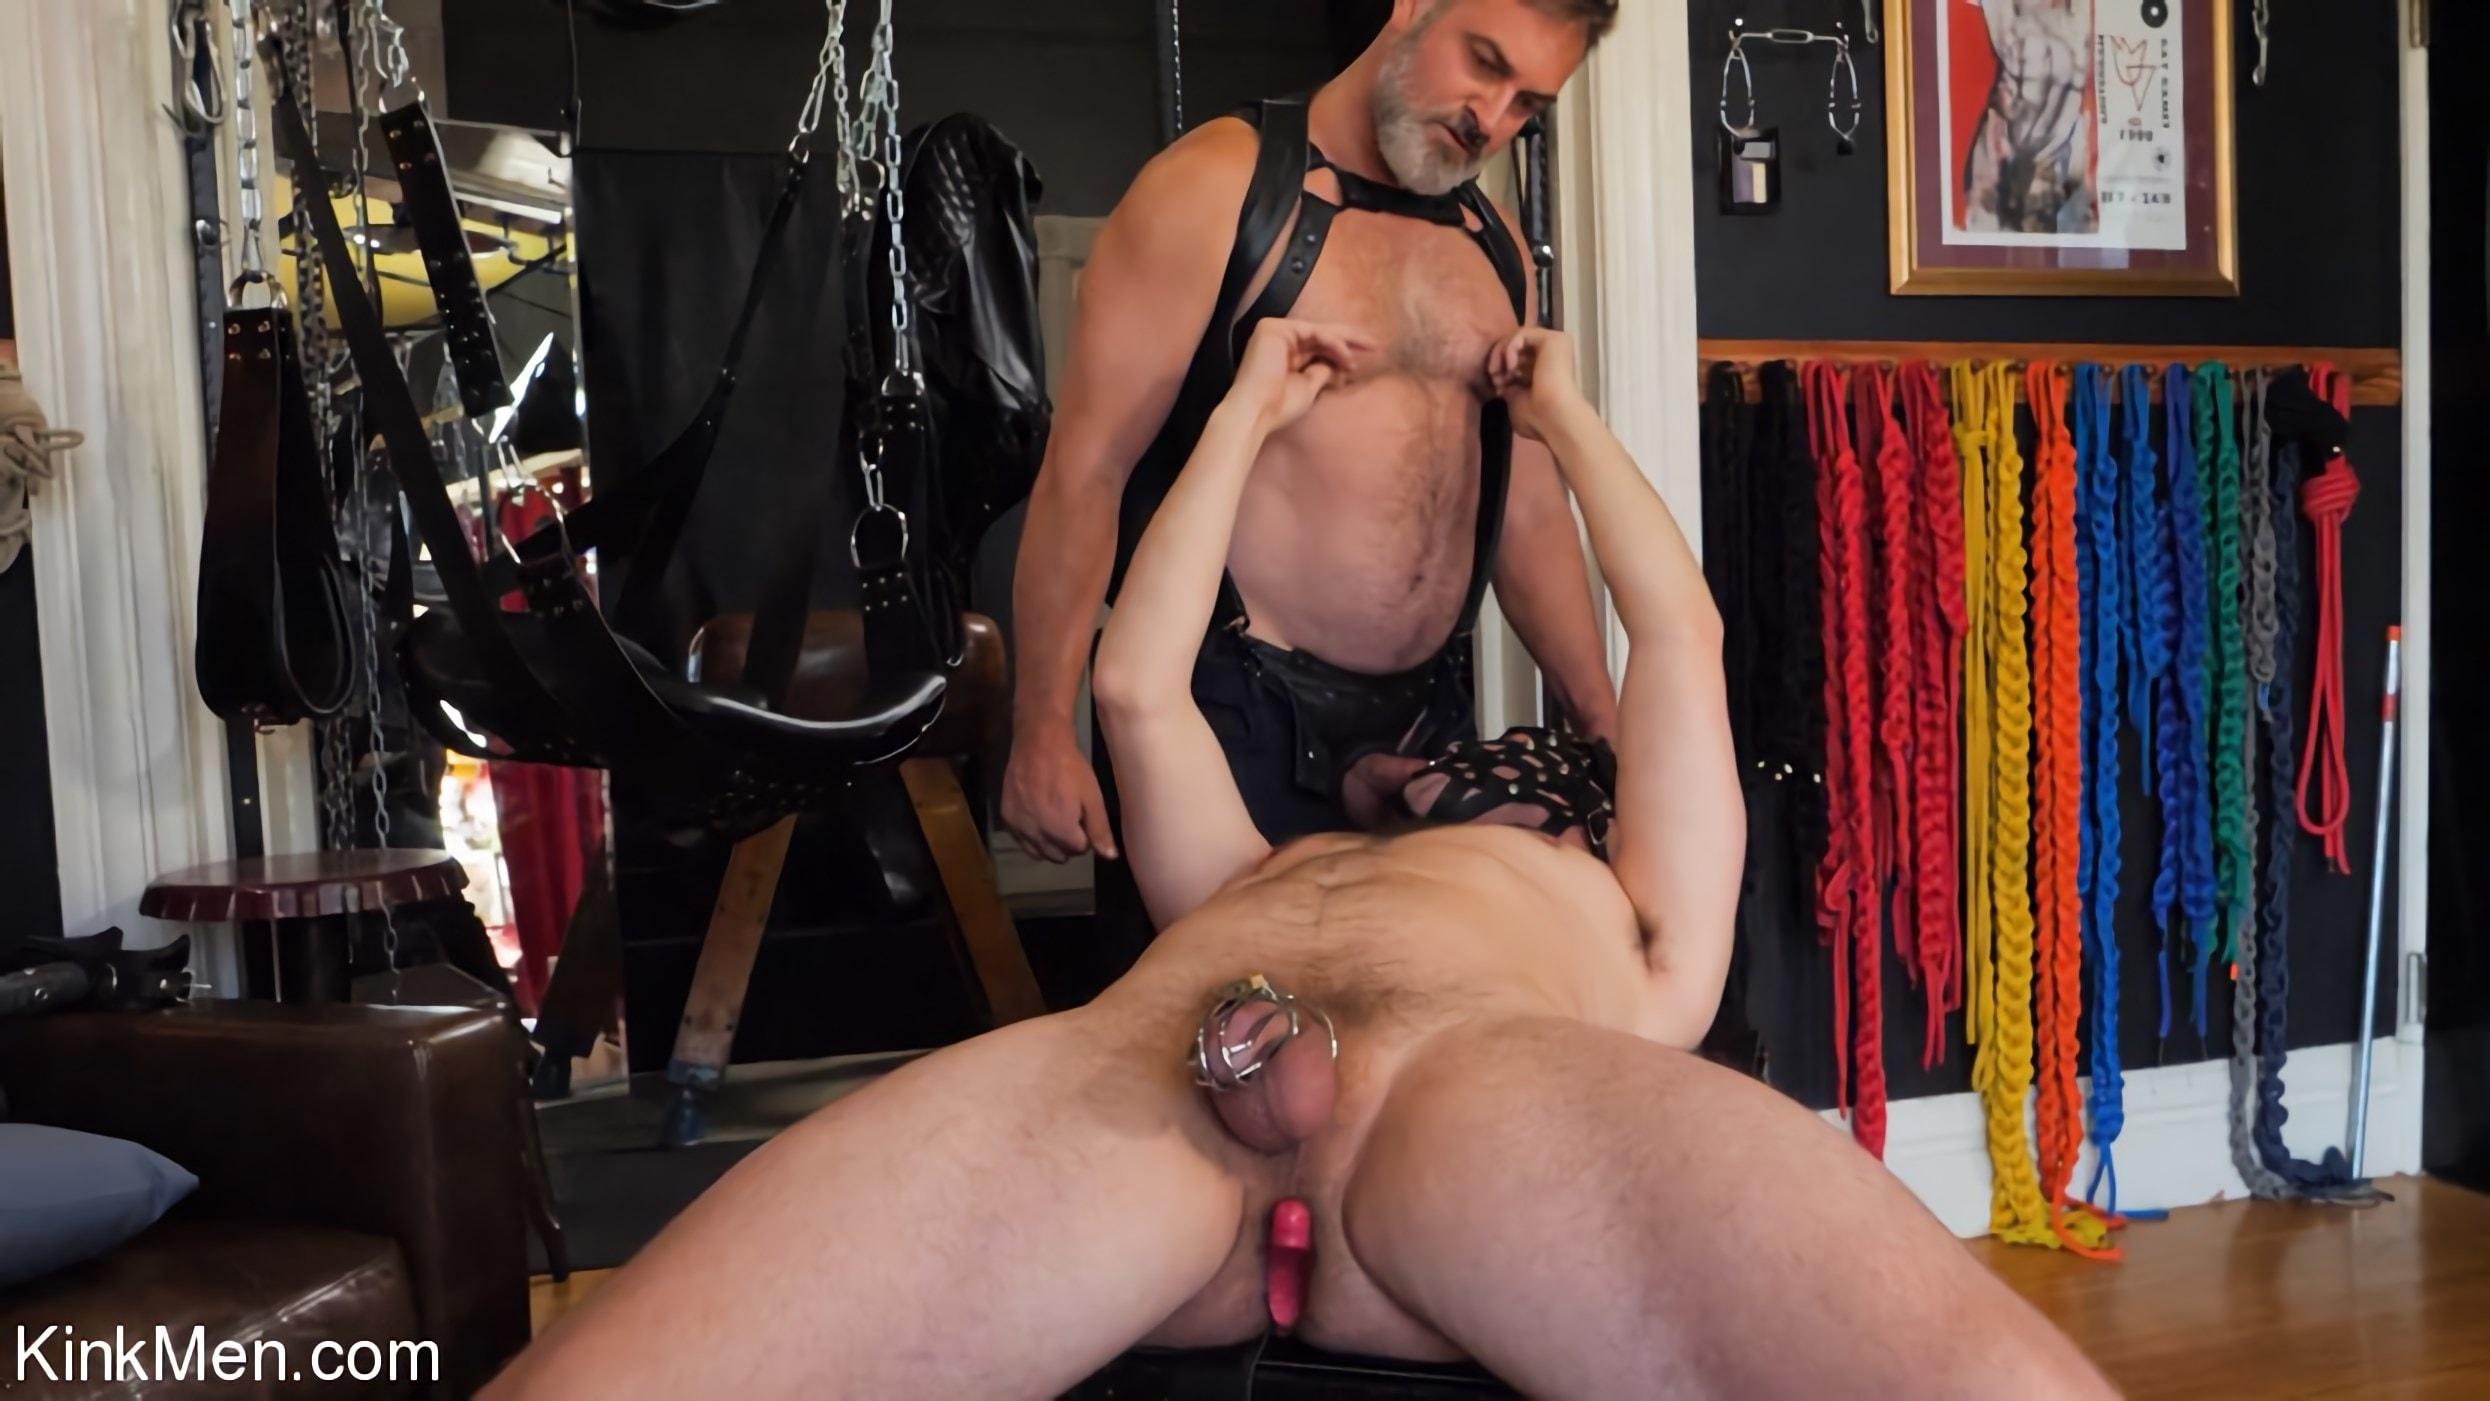 Kink Men 'The Suffering of Scott Ryder: Part Two' starring Kristofer Weston (Photo 19)